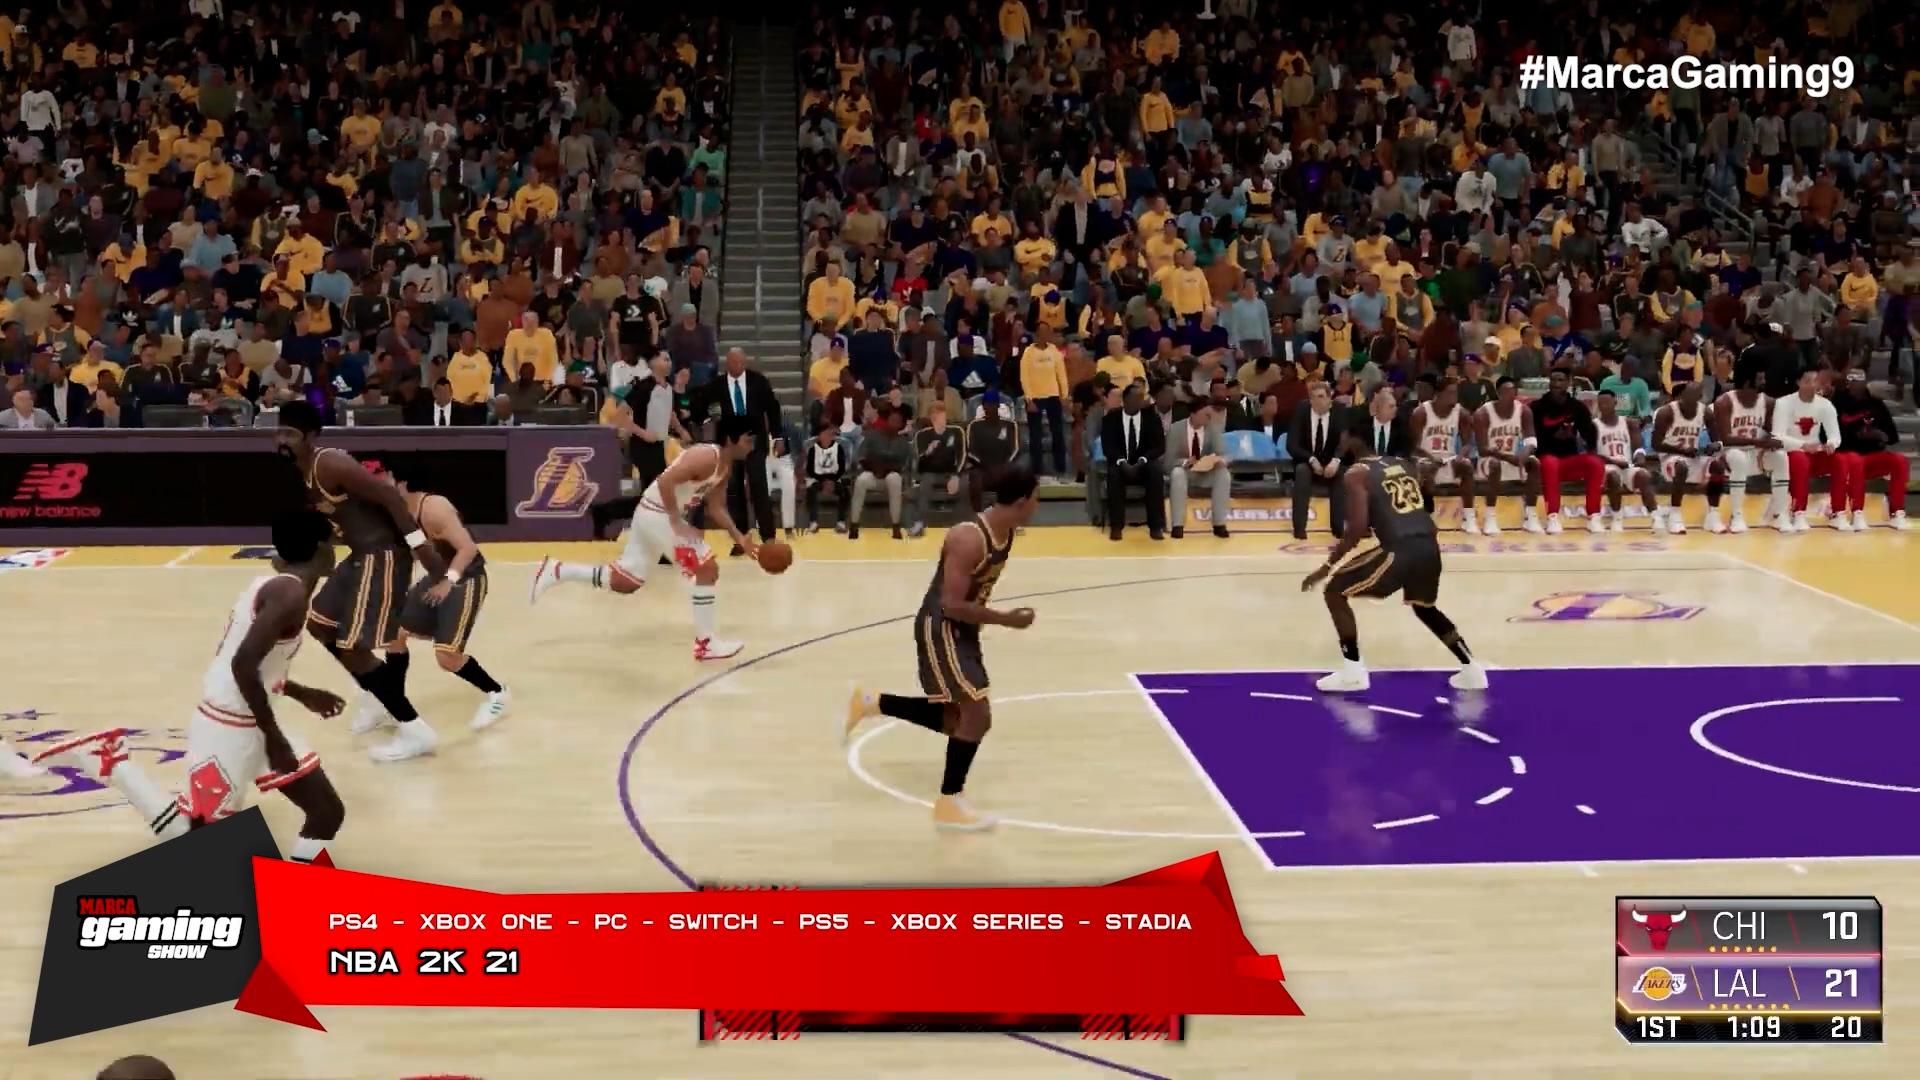 NBA 2K 21 (PS4 - XBOX ONE - PC - SWITCH - PS5 - XBOX SERIES - STADIA)